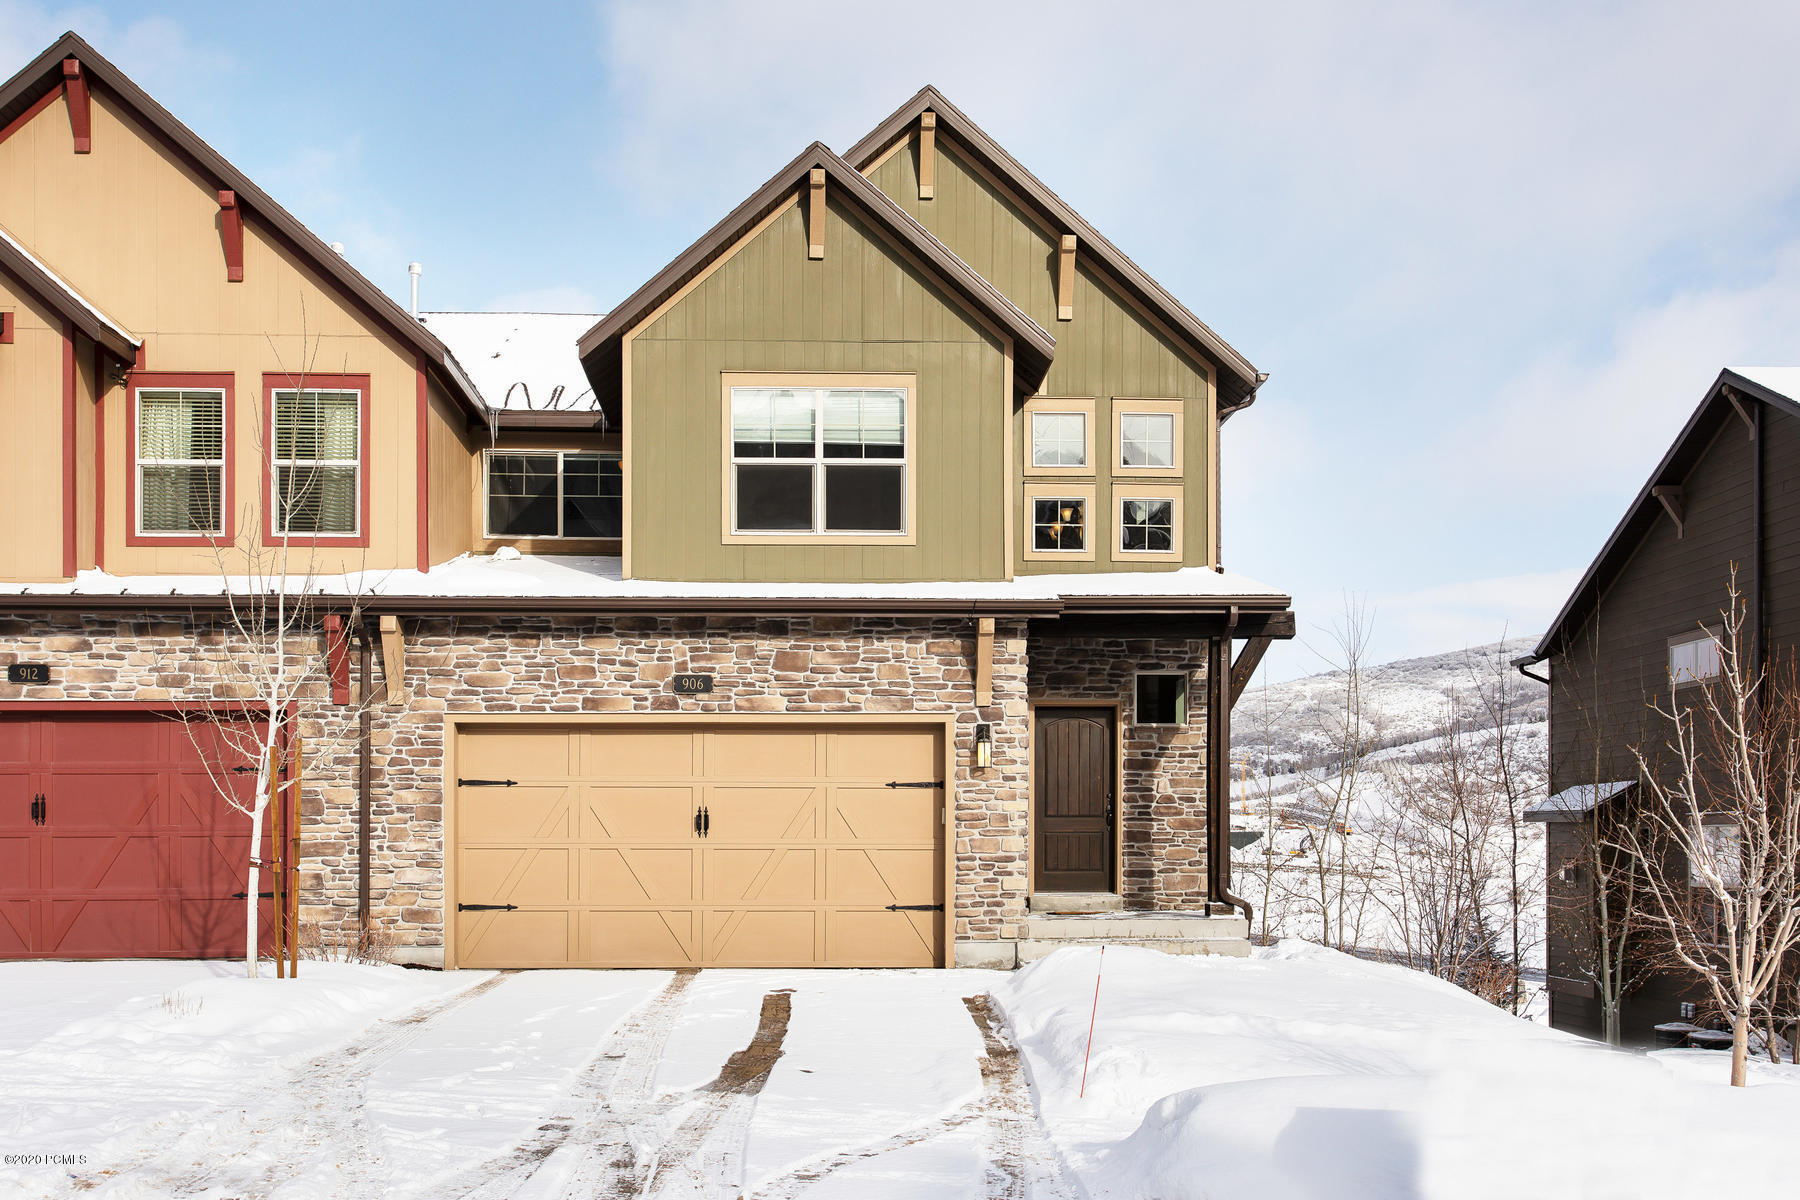 906 Abigail Drive, Kamas, Utah 84036, 4 Bedrooms Bedrooms, ,4 BathroomsBathrooms,Condominium,For Sale,Abigail,20190109112430415765000000